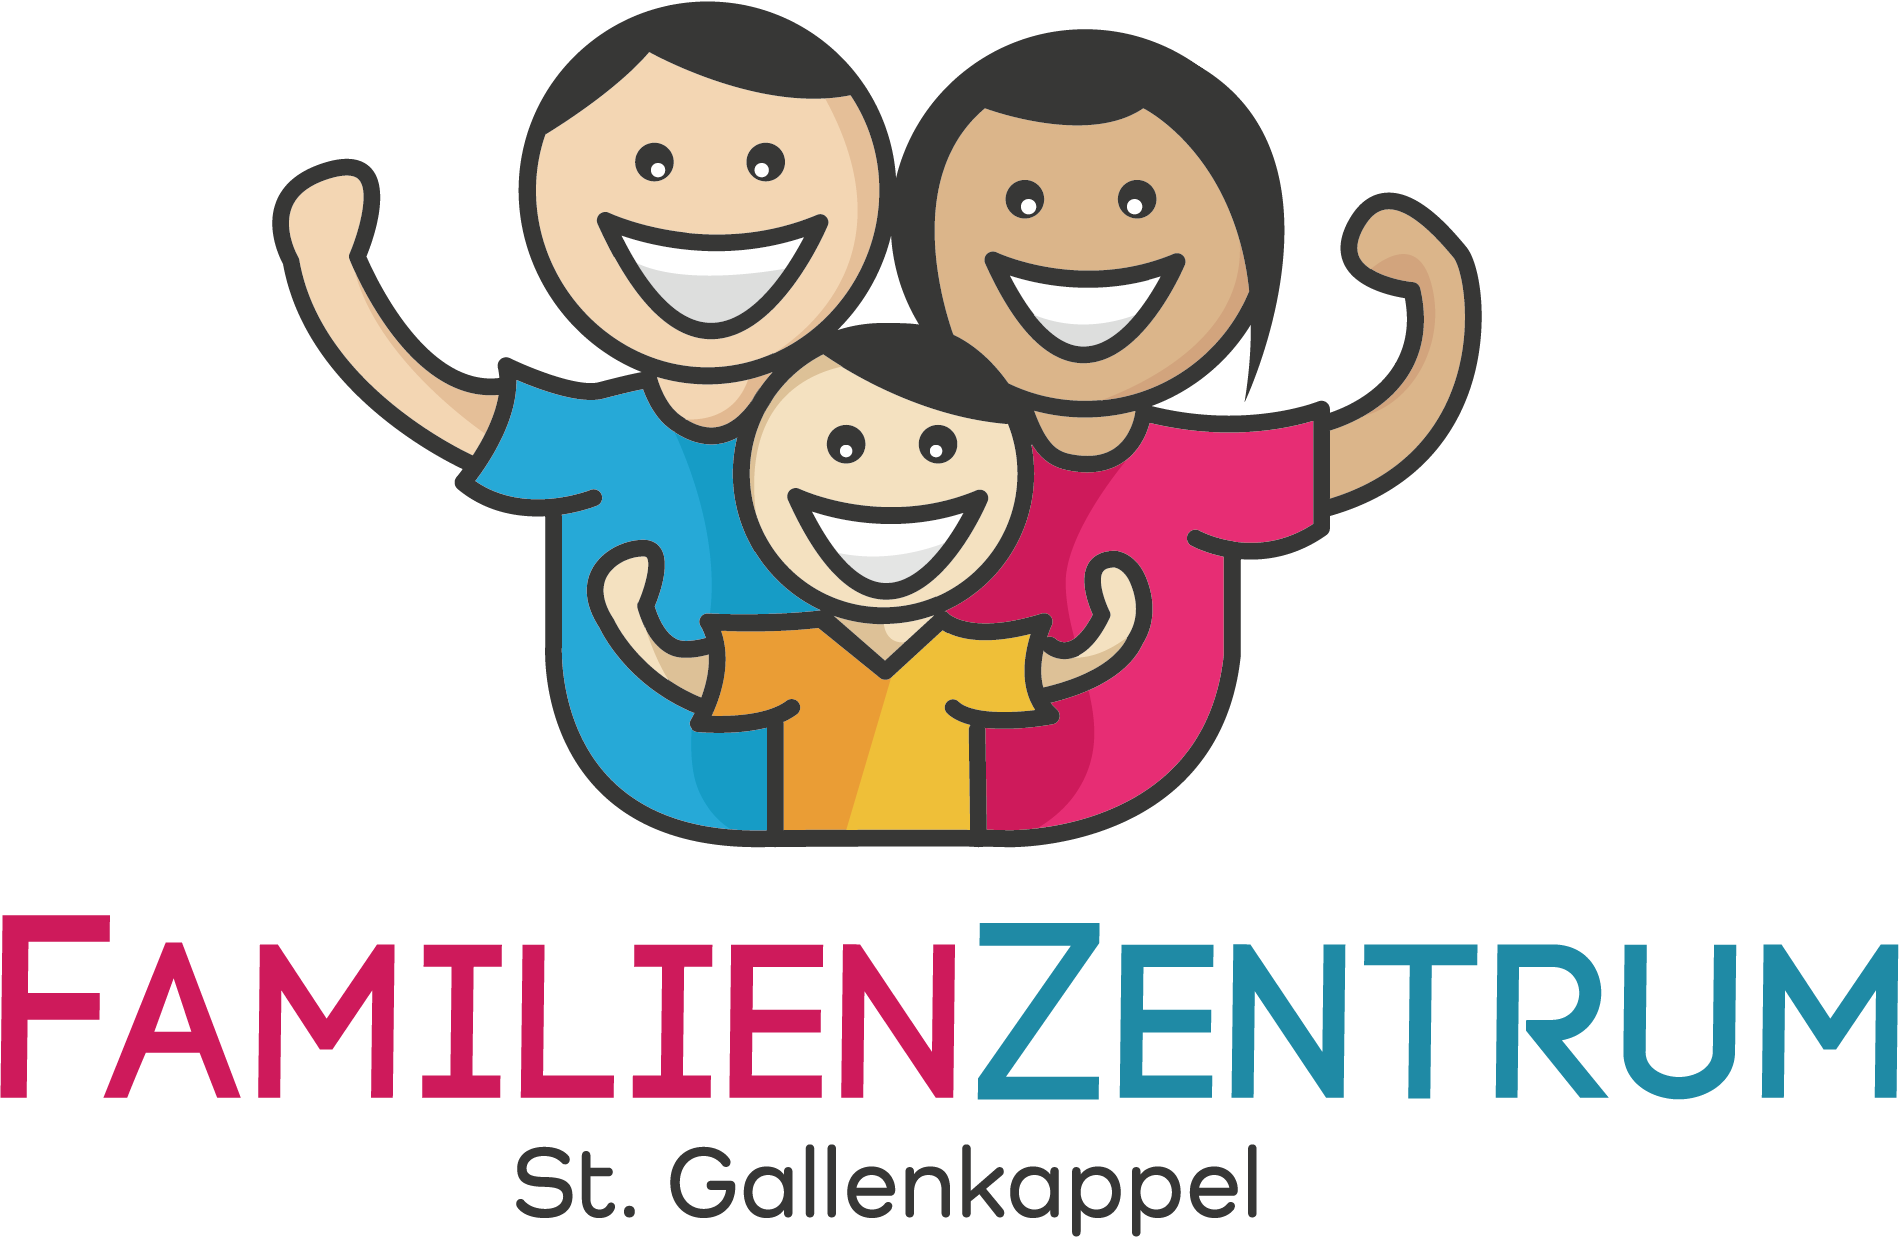 Familienzentrum - St. Gallenkappel